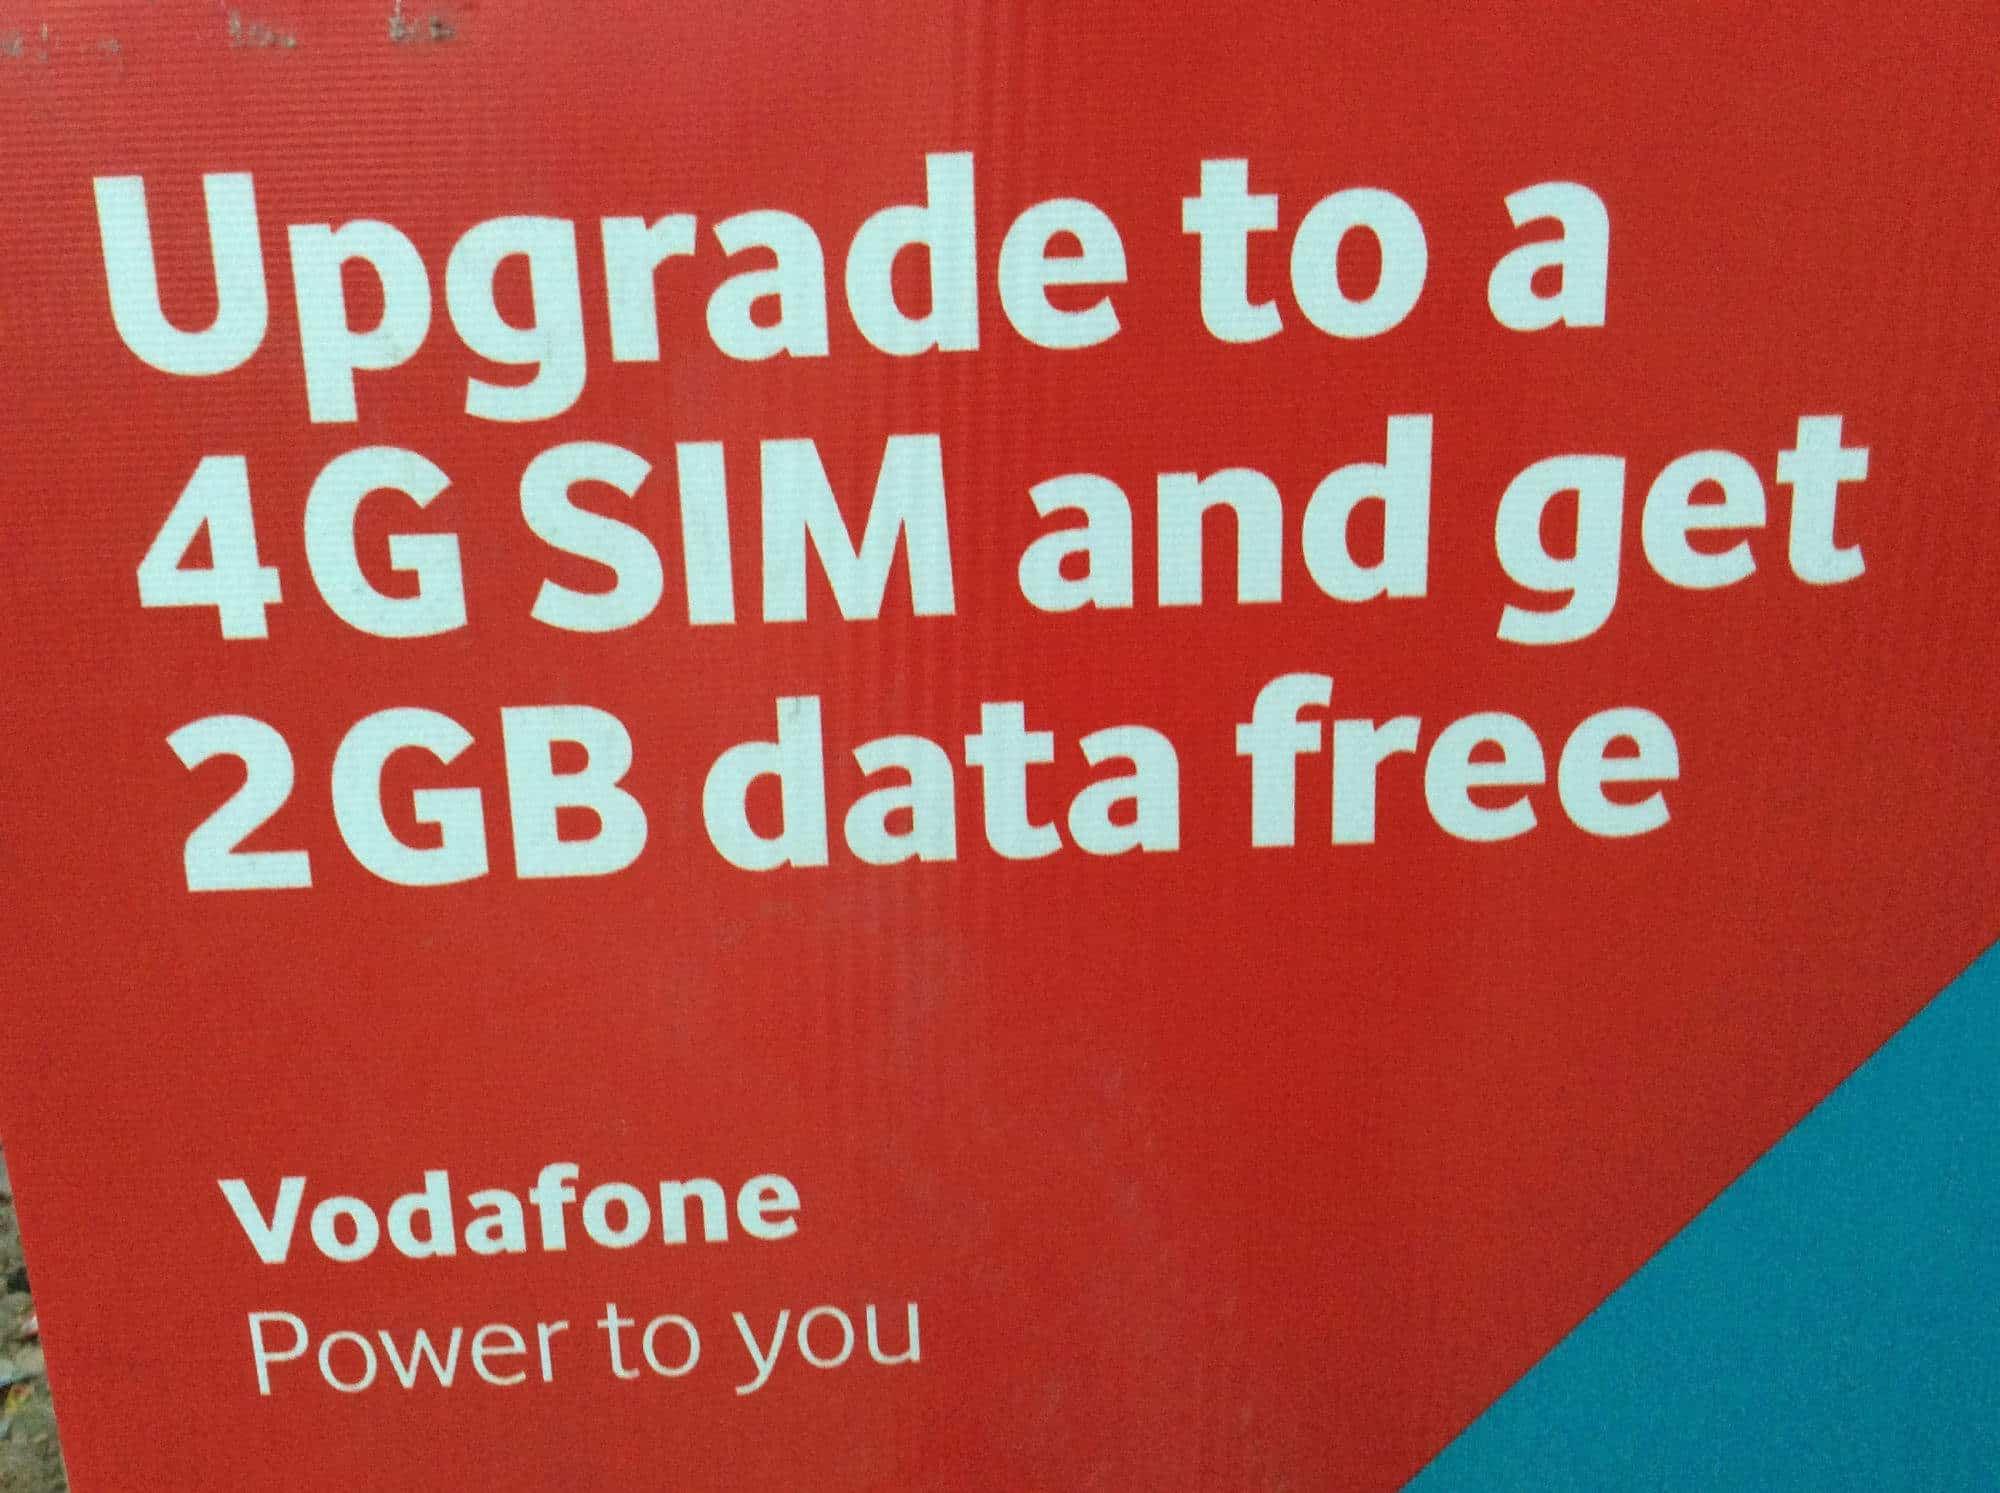 Vodafone Mini Store, Pipla - Postpaid Mobile Phone Simcard